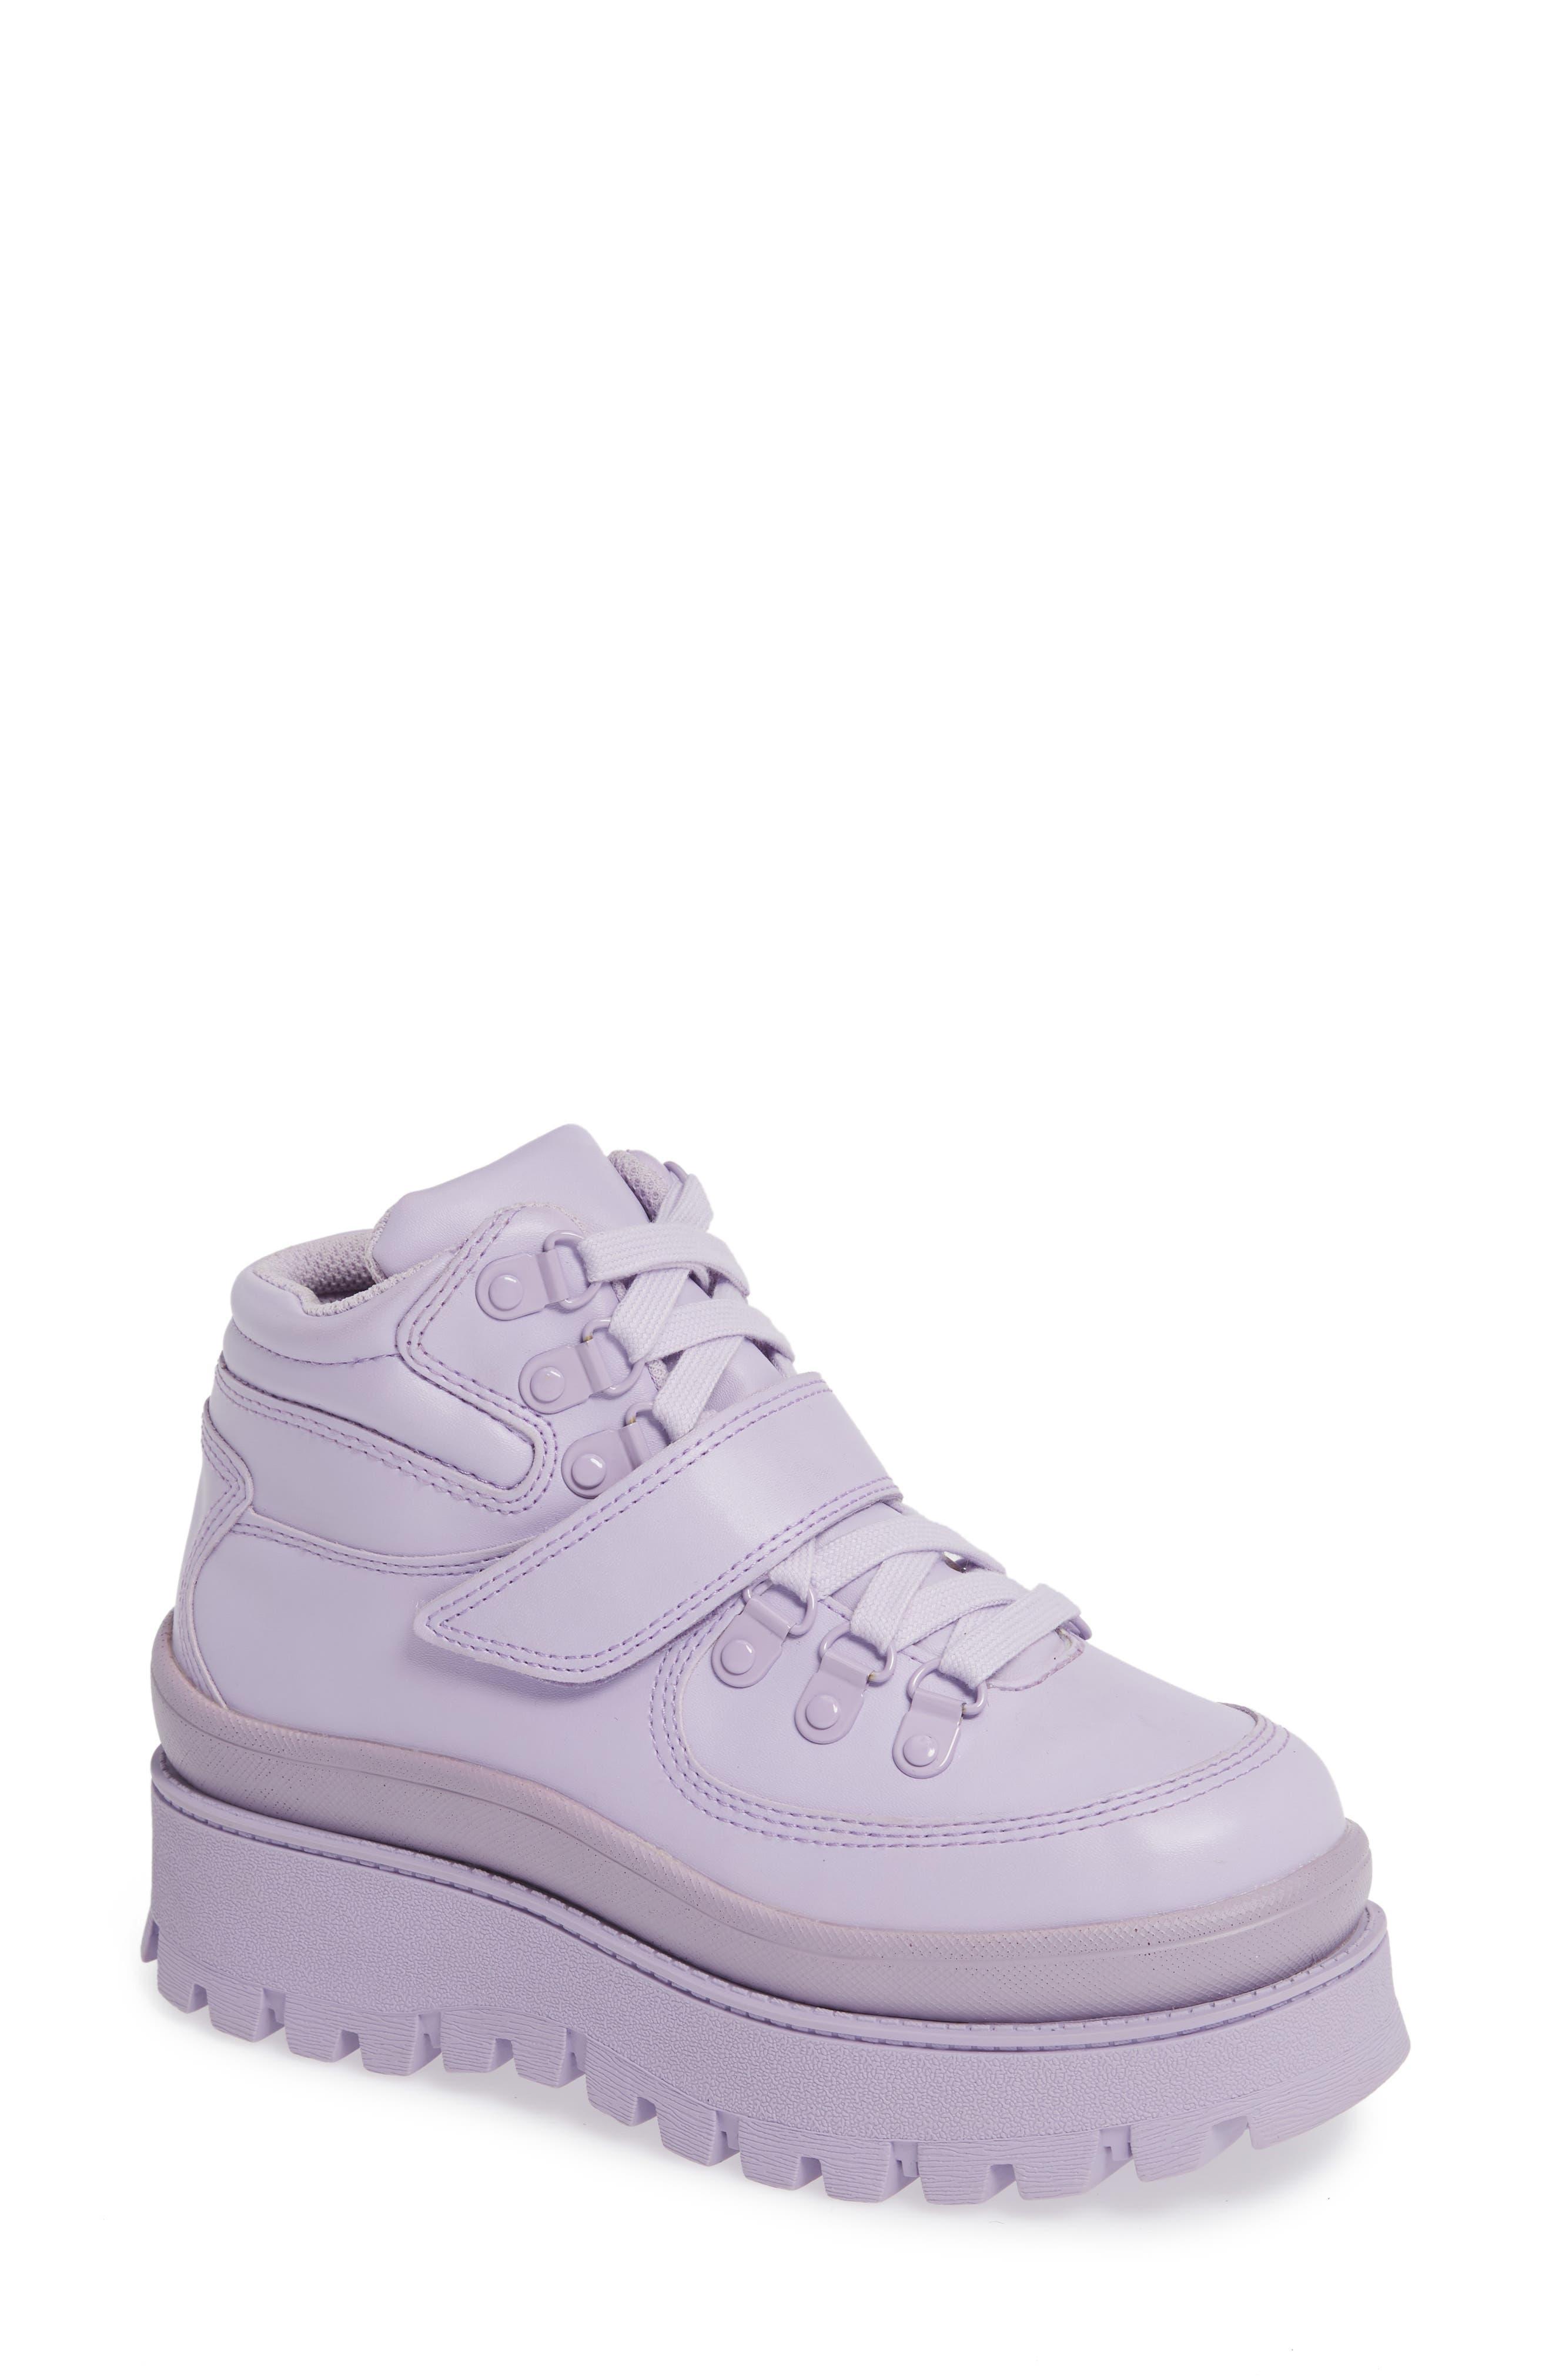 3b6d7304bd5 Women s Jeffrey Campbell Sneakers   Running Shoes